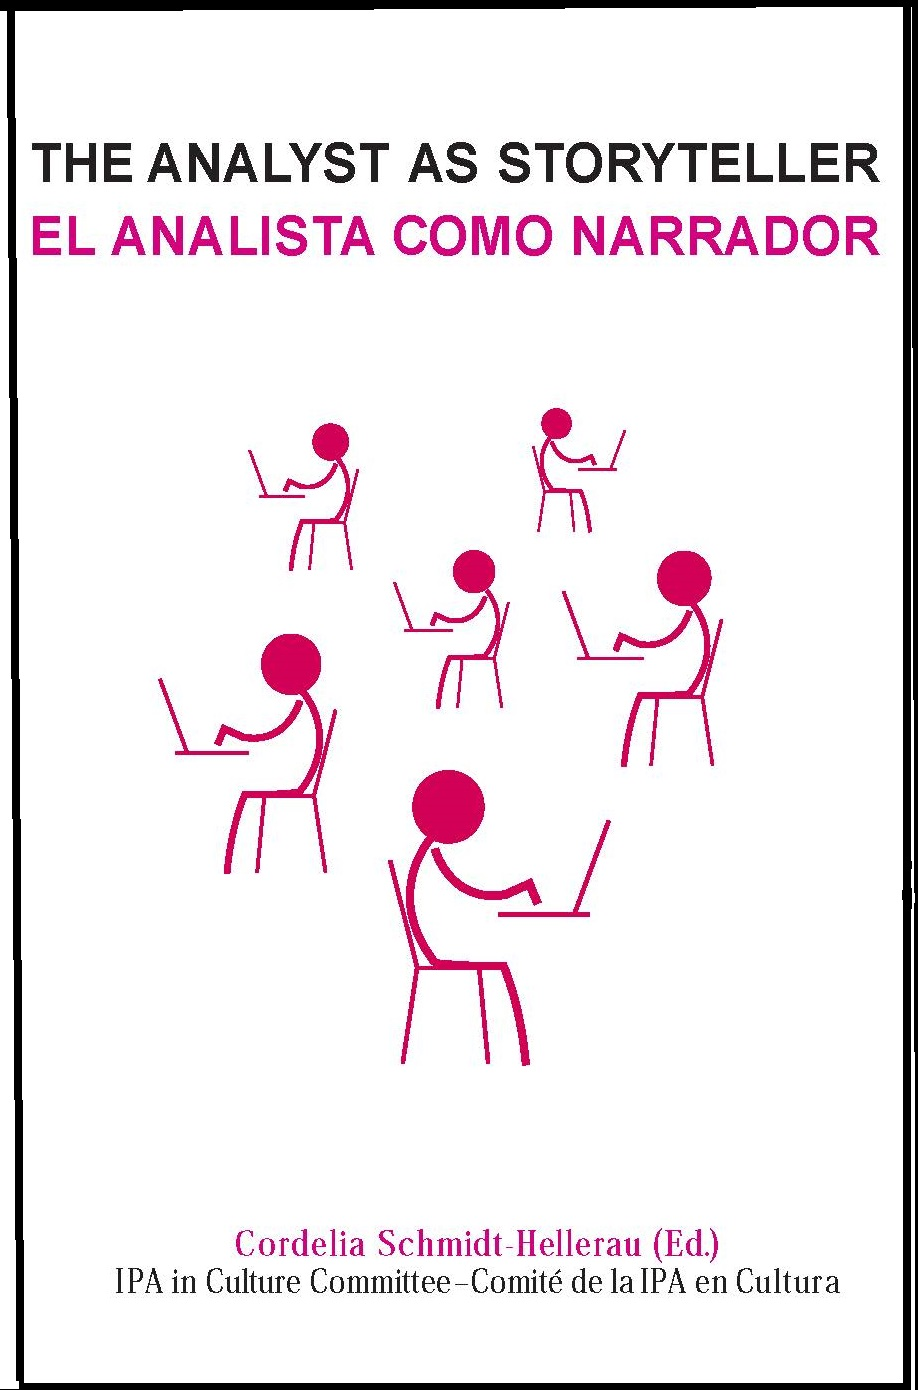 The Analyst as Storyteller / El Analista como Narrador